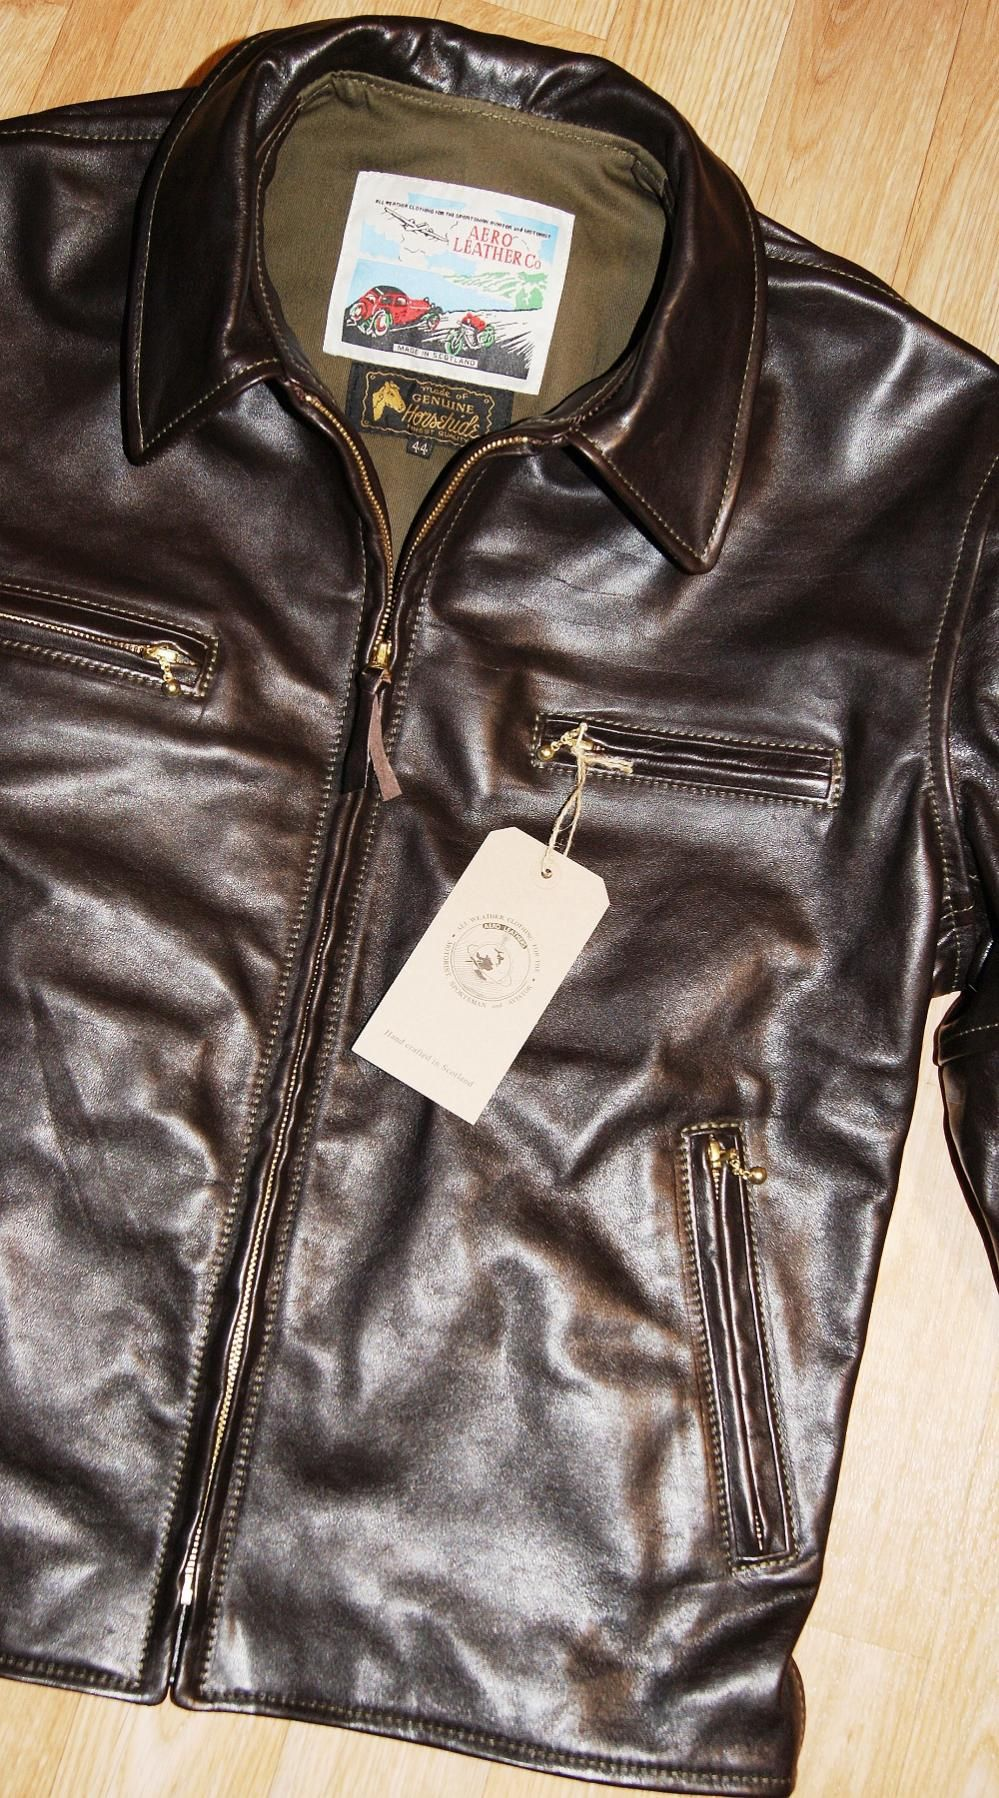 Insurrection Thurston Italian Full Grain Veg Tanned Horsehide For Aero Jackets Page 31 Leather Jacket Men Leather Jacket Men Style Leather Jacket Style [ 1798 x 999 Pixel ]